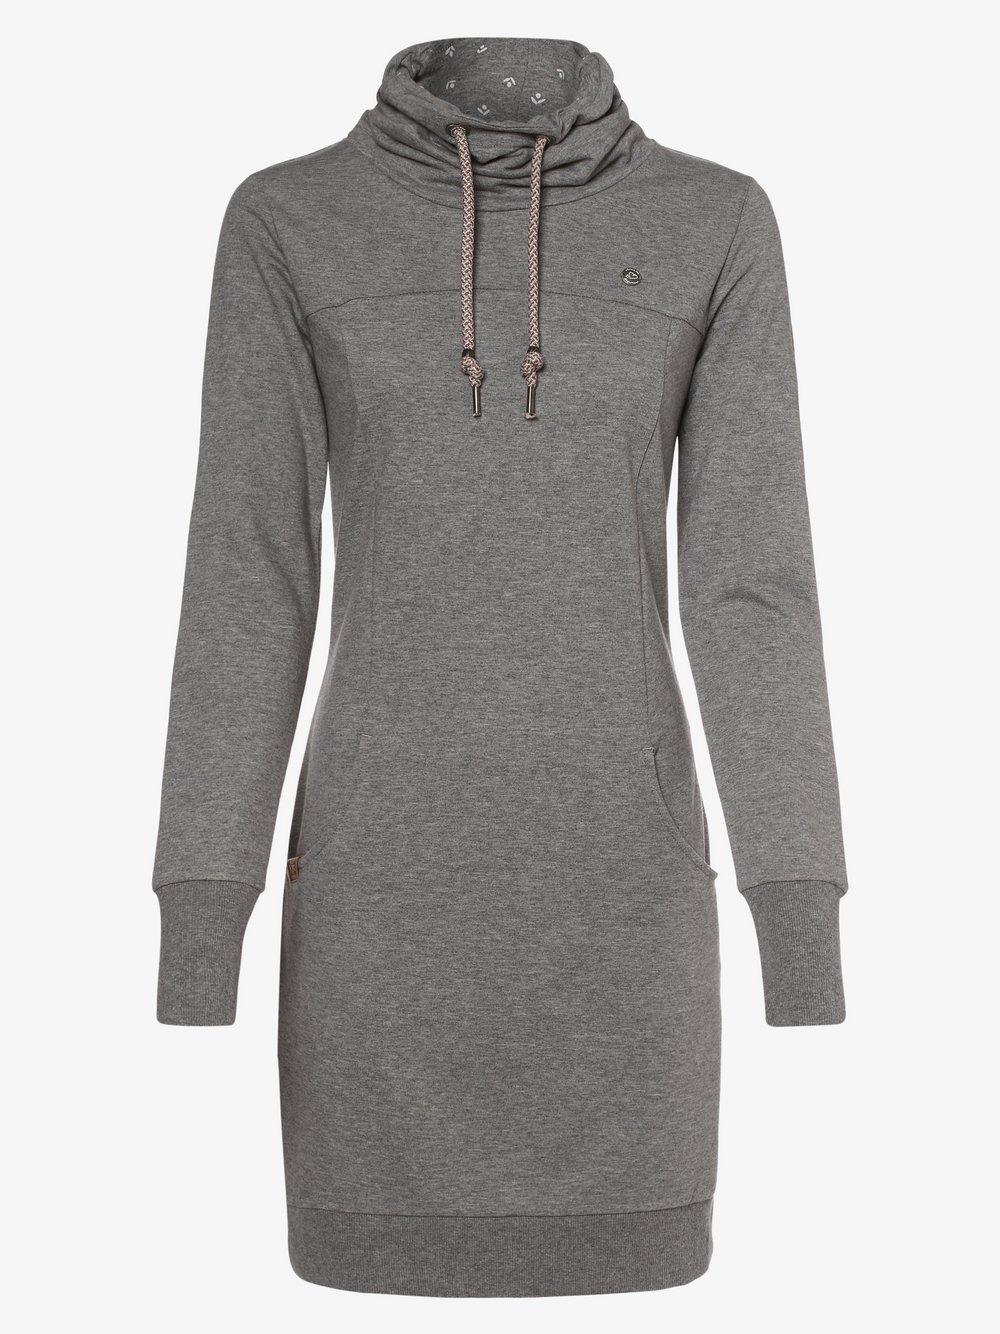 Ragwear - Sukienka damska – Dita, szary Ragwear